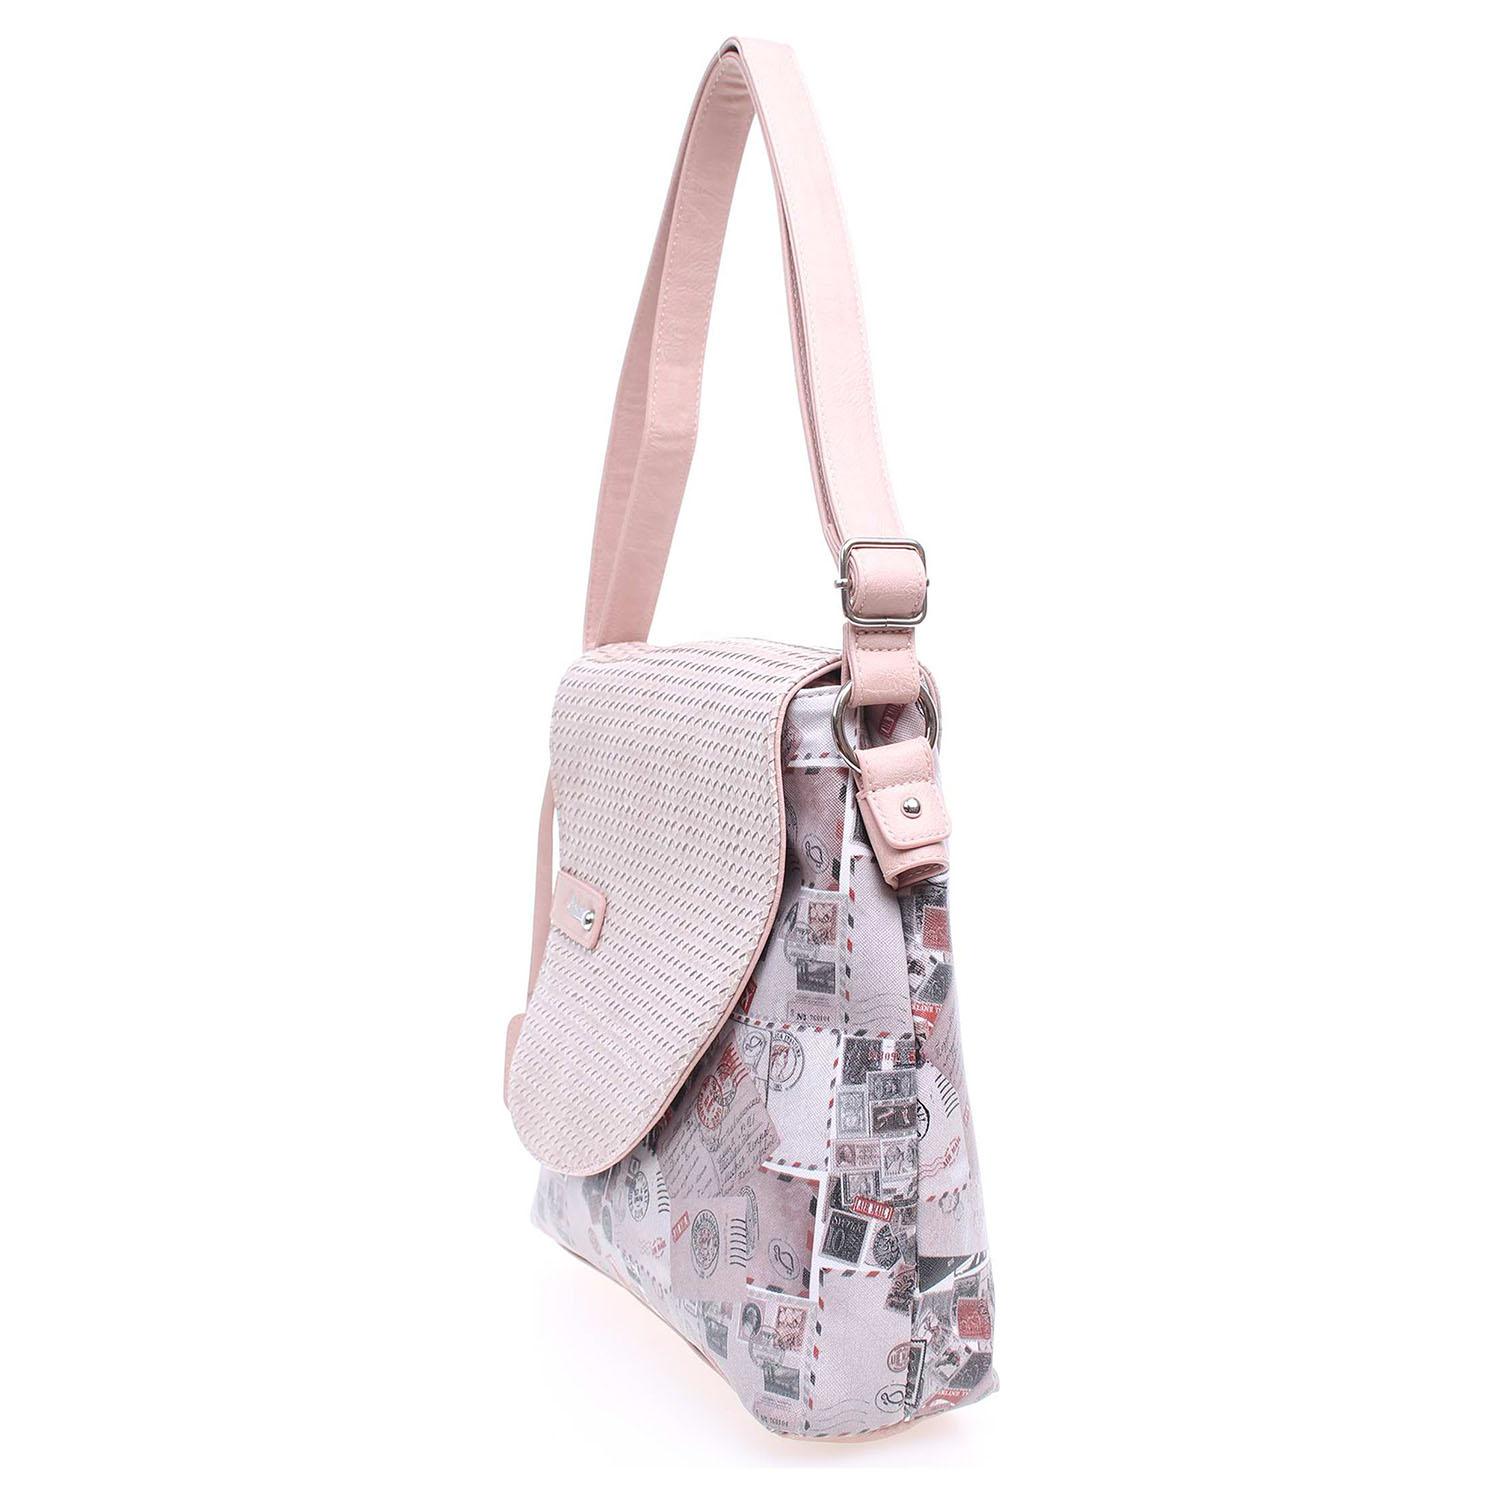 Ecco Rieker dámská kabelka H1107-31 rosa 11890910